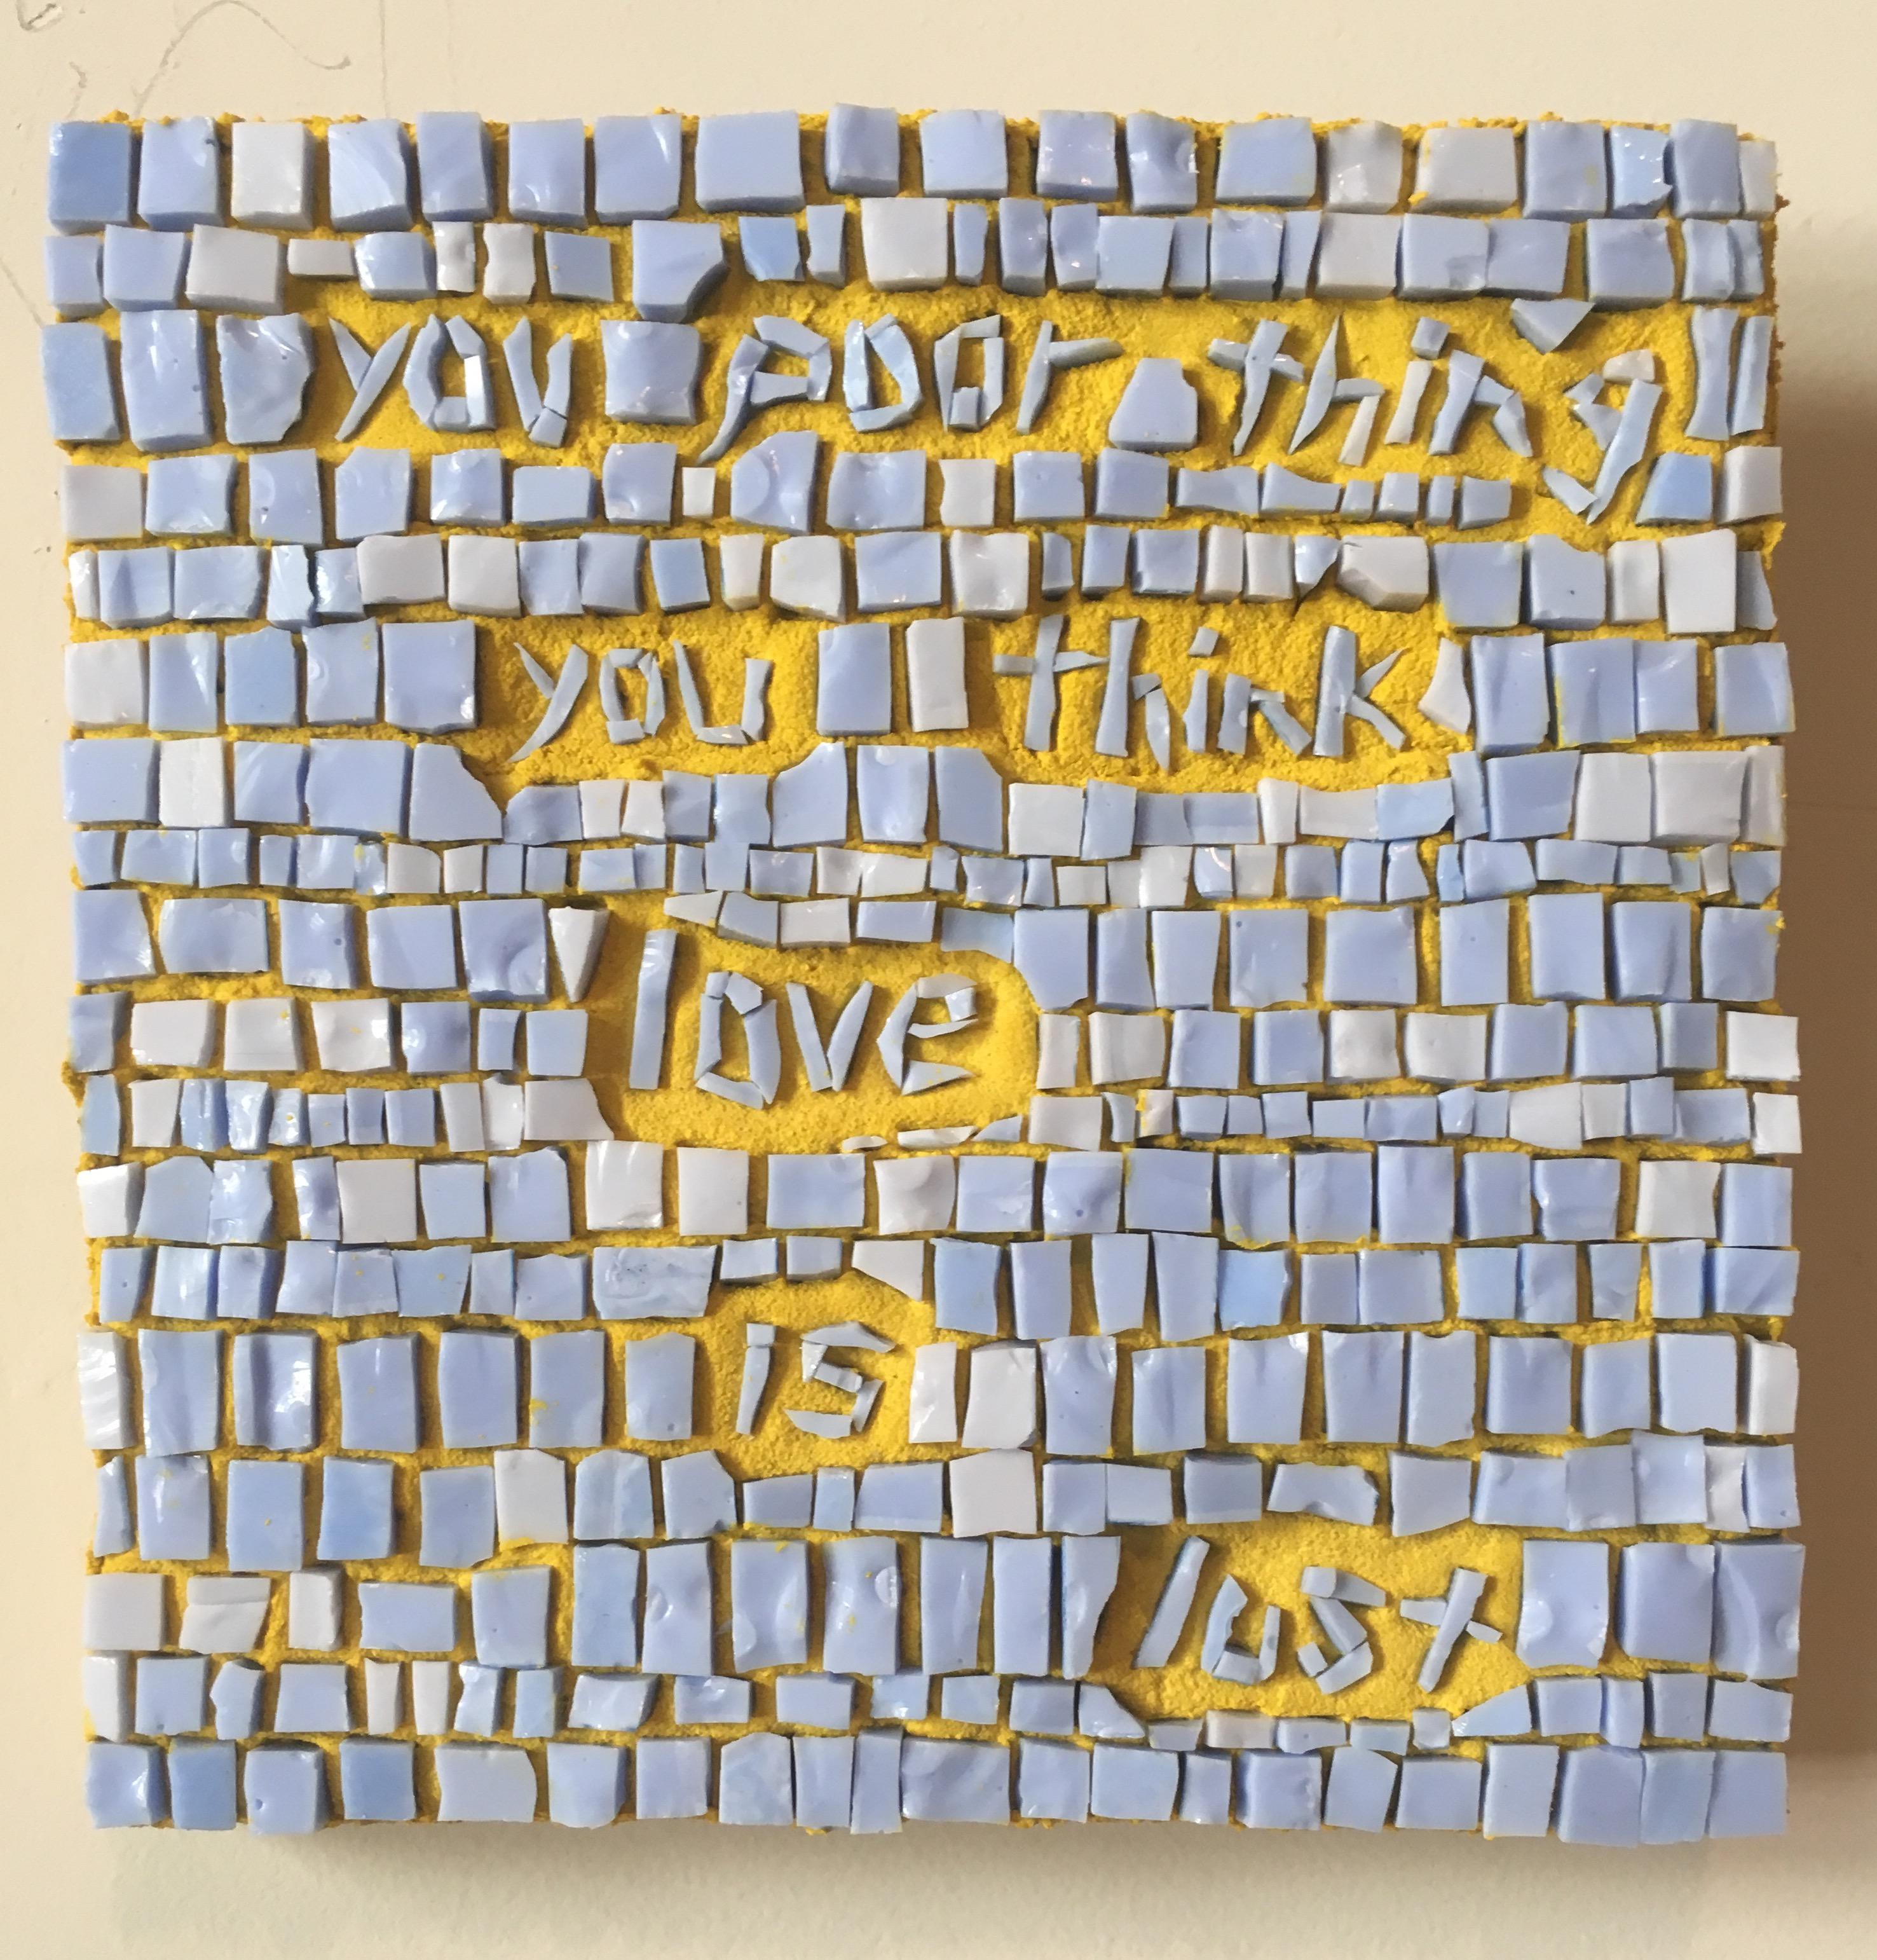 Mosaic Poem 1 (you poor thing)